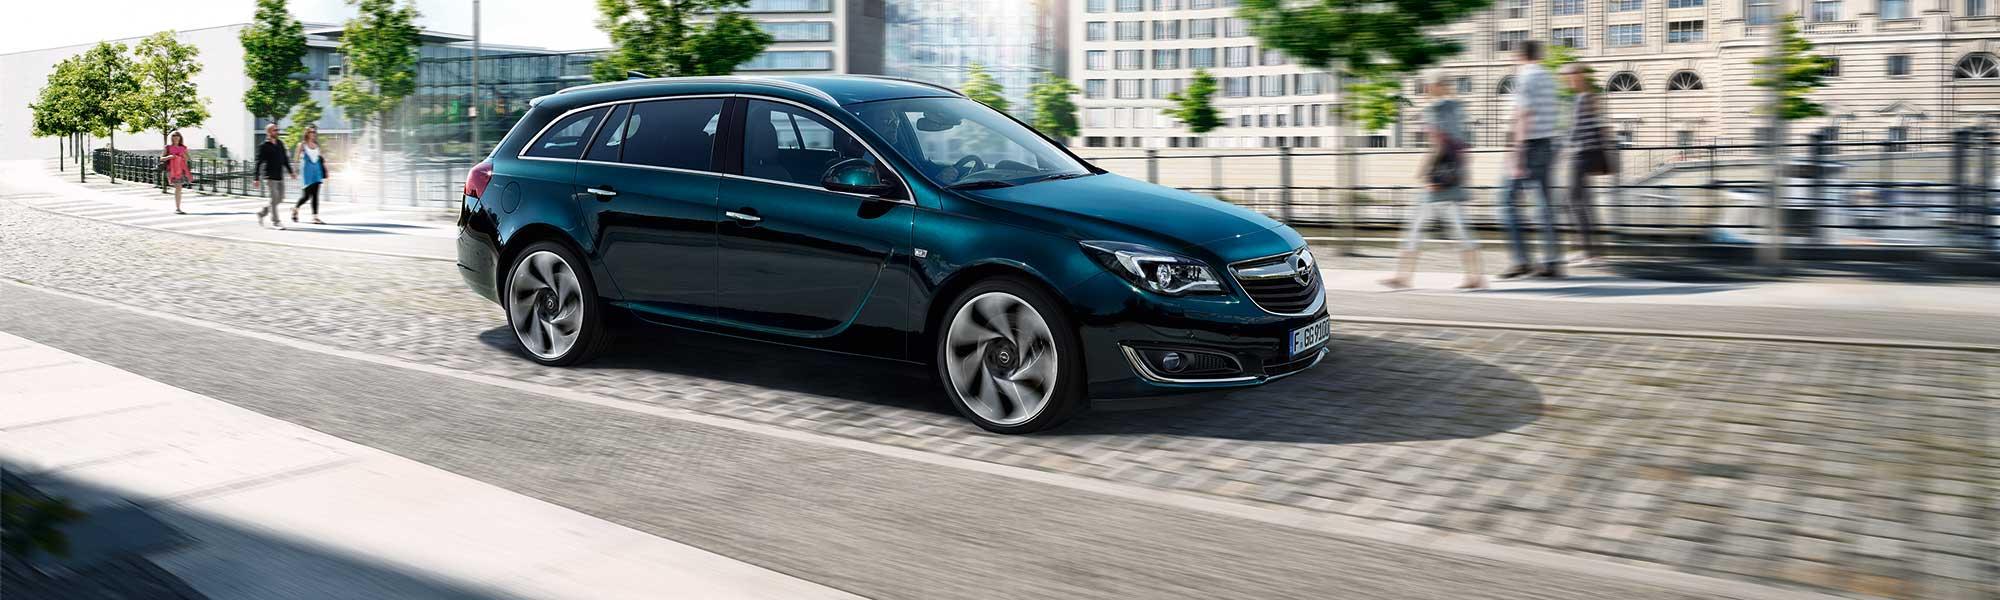 Der Opel Insignia Sportstourer bei Ulmen